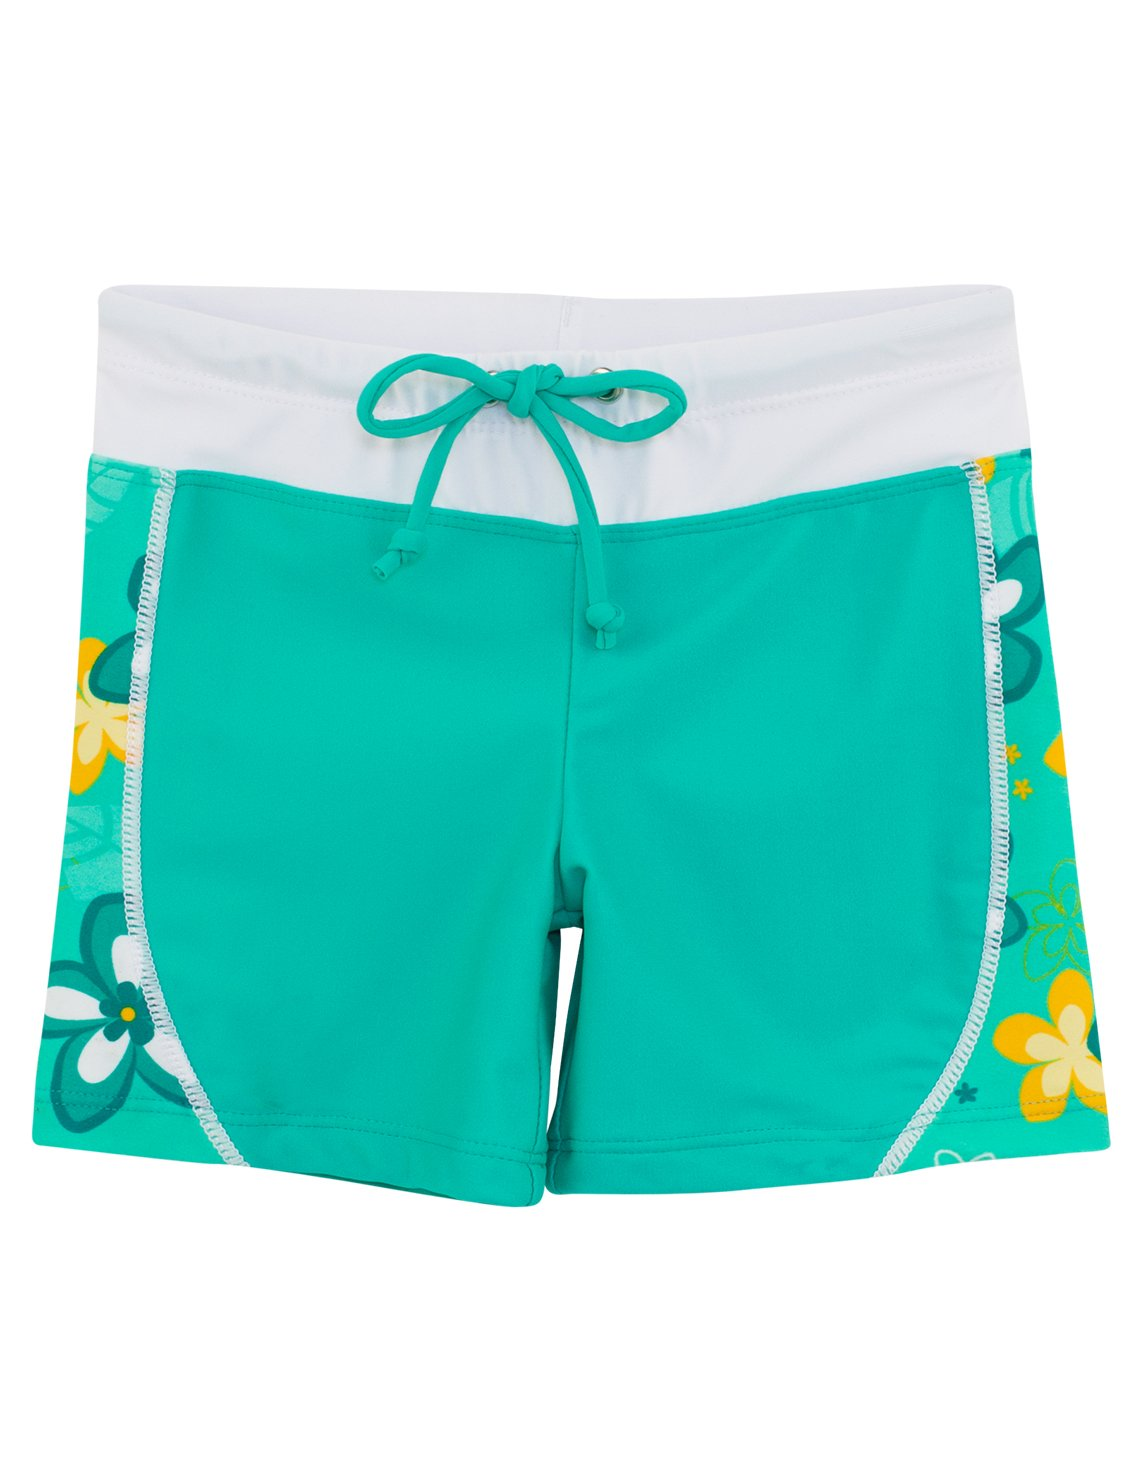 Tuga Girls Swim Shorts 1-14 Years, UPF 50+ Sun Protection Board Short